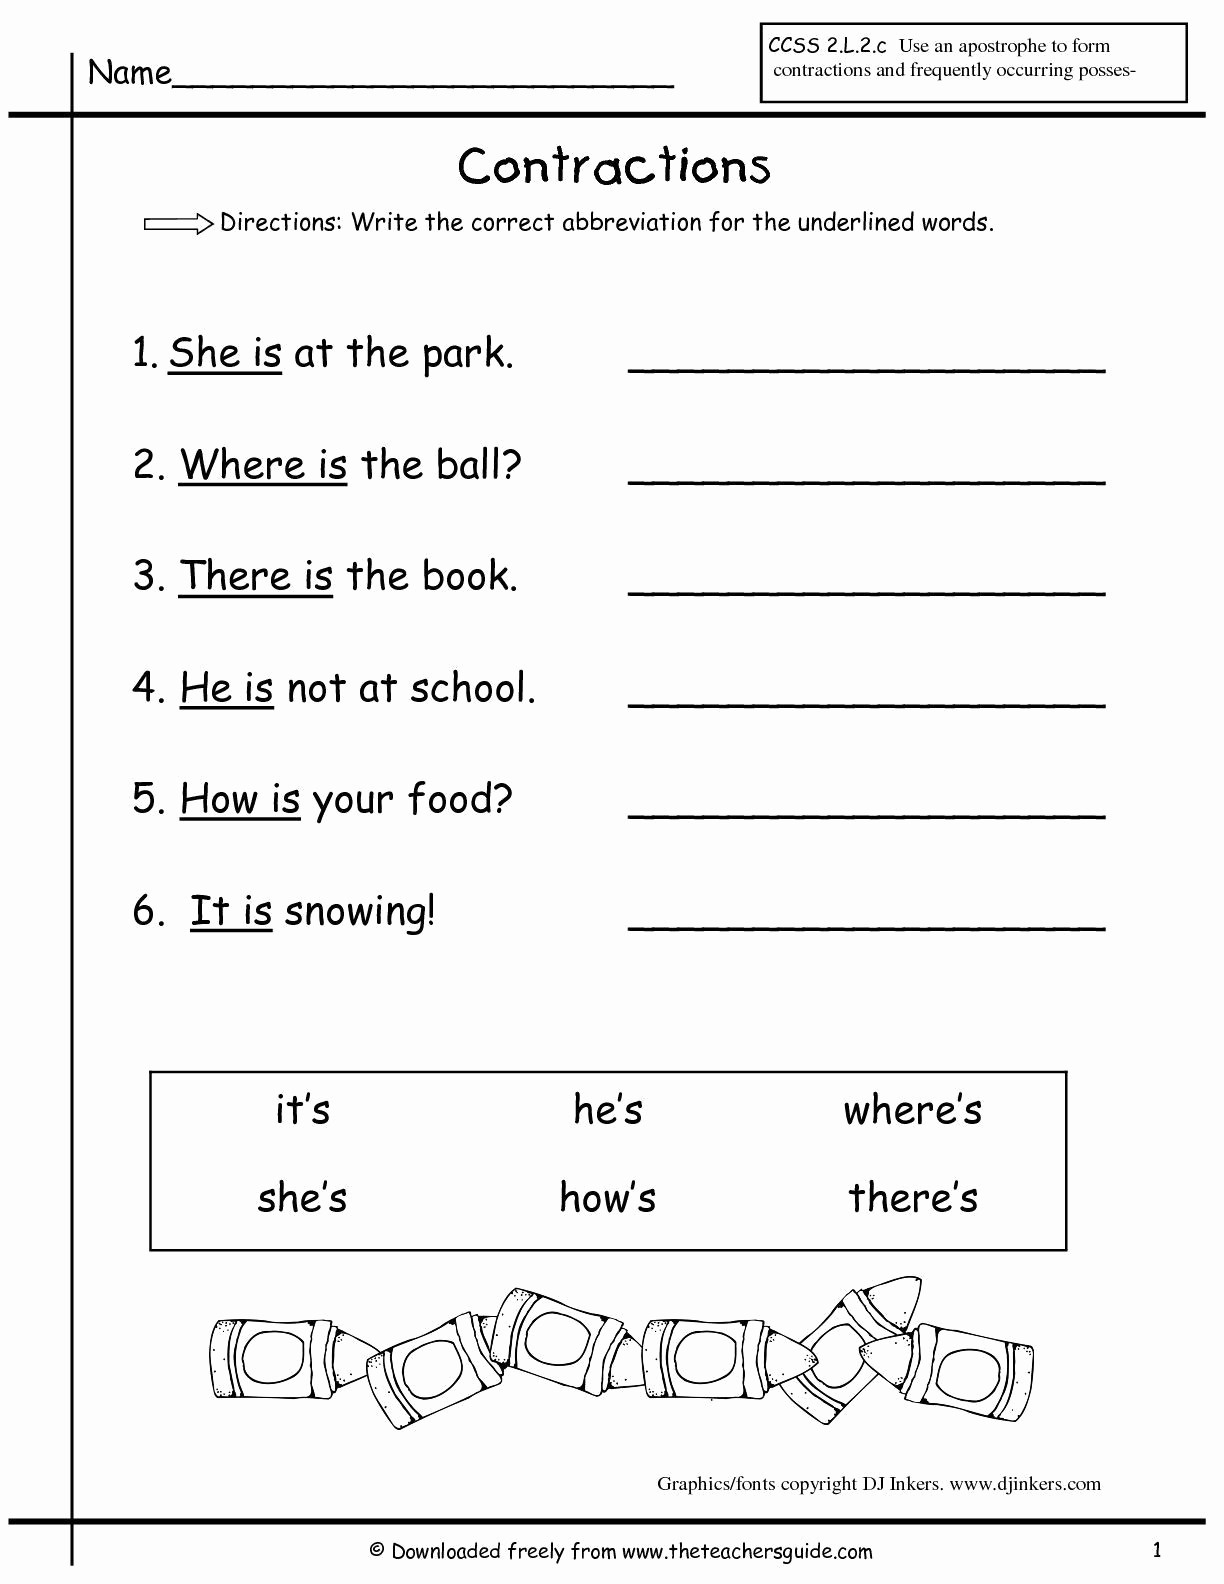 Second Grade Science Worksheets Db Excel